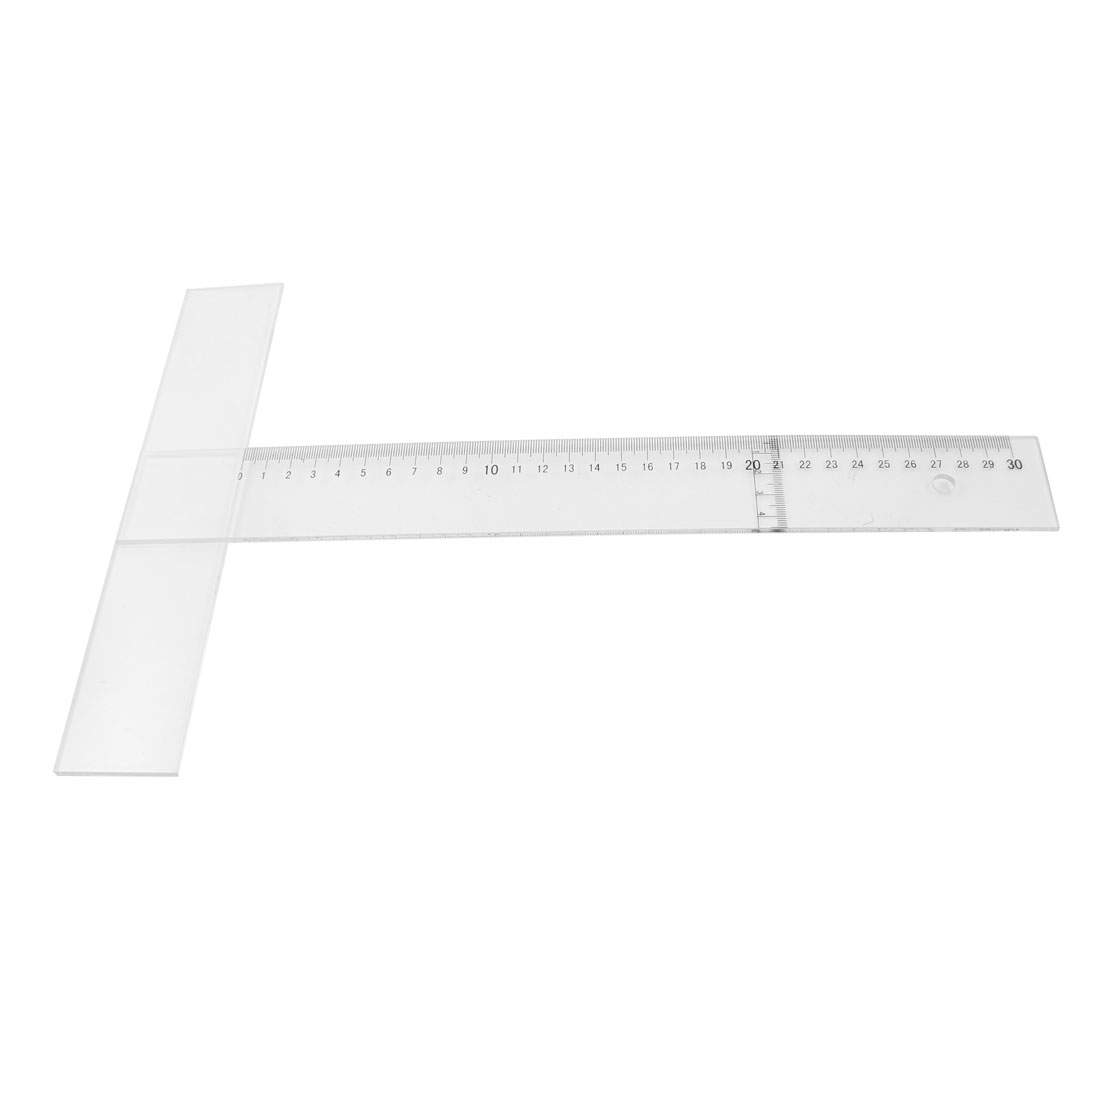 30cm Measurement Black Arabic Numeral Dial Clear T-square Ruler